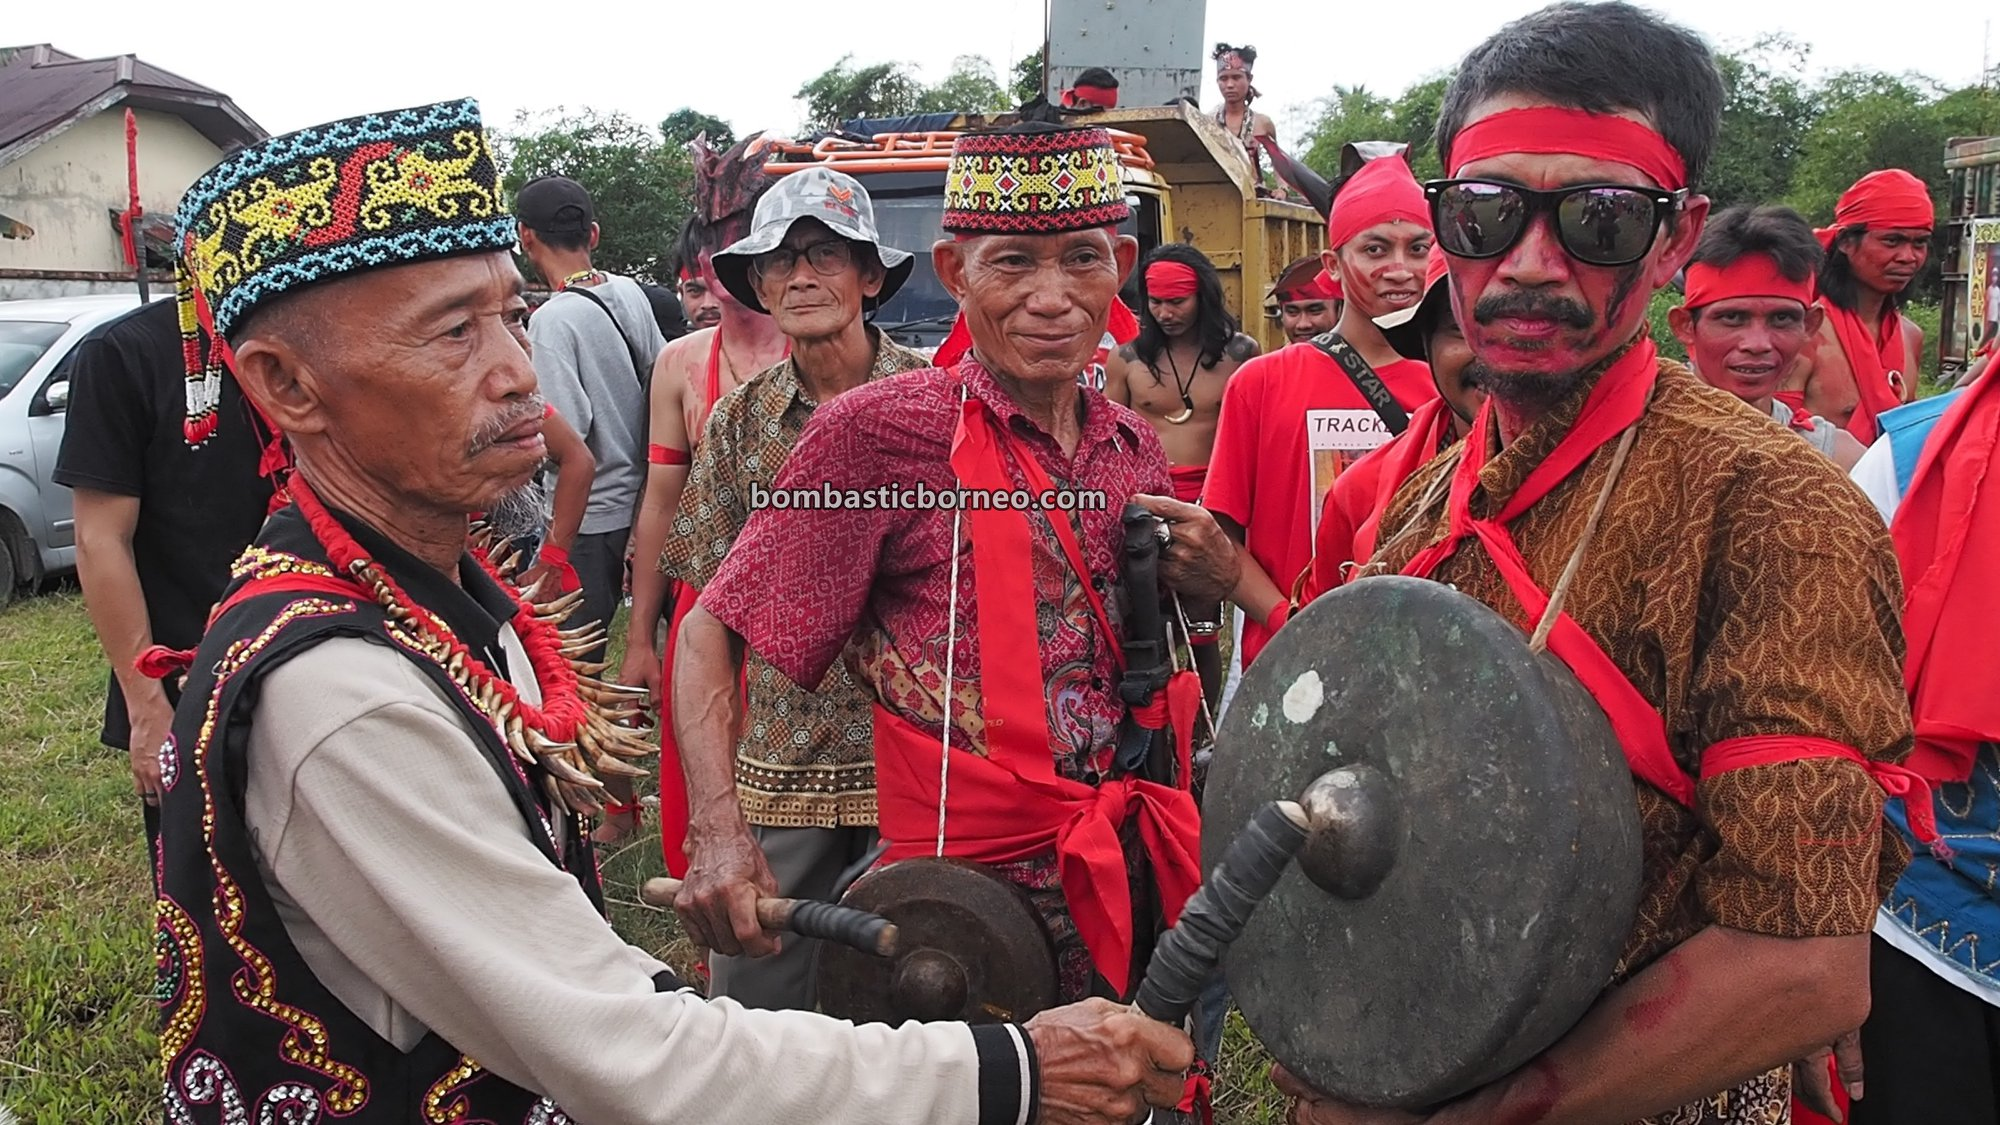 Festival Budaya Dayak, indigenous, Ethnic, tribe, event, Indonesia, Tangkitn raksasa, backpackers, Tourism, tourist attraction, travel guide, Trans Borneo, 穿越婆罗洲印尼, 西加里曼丹原住民, 孟加映土著部落